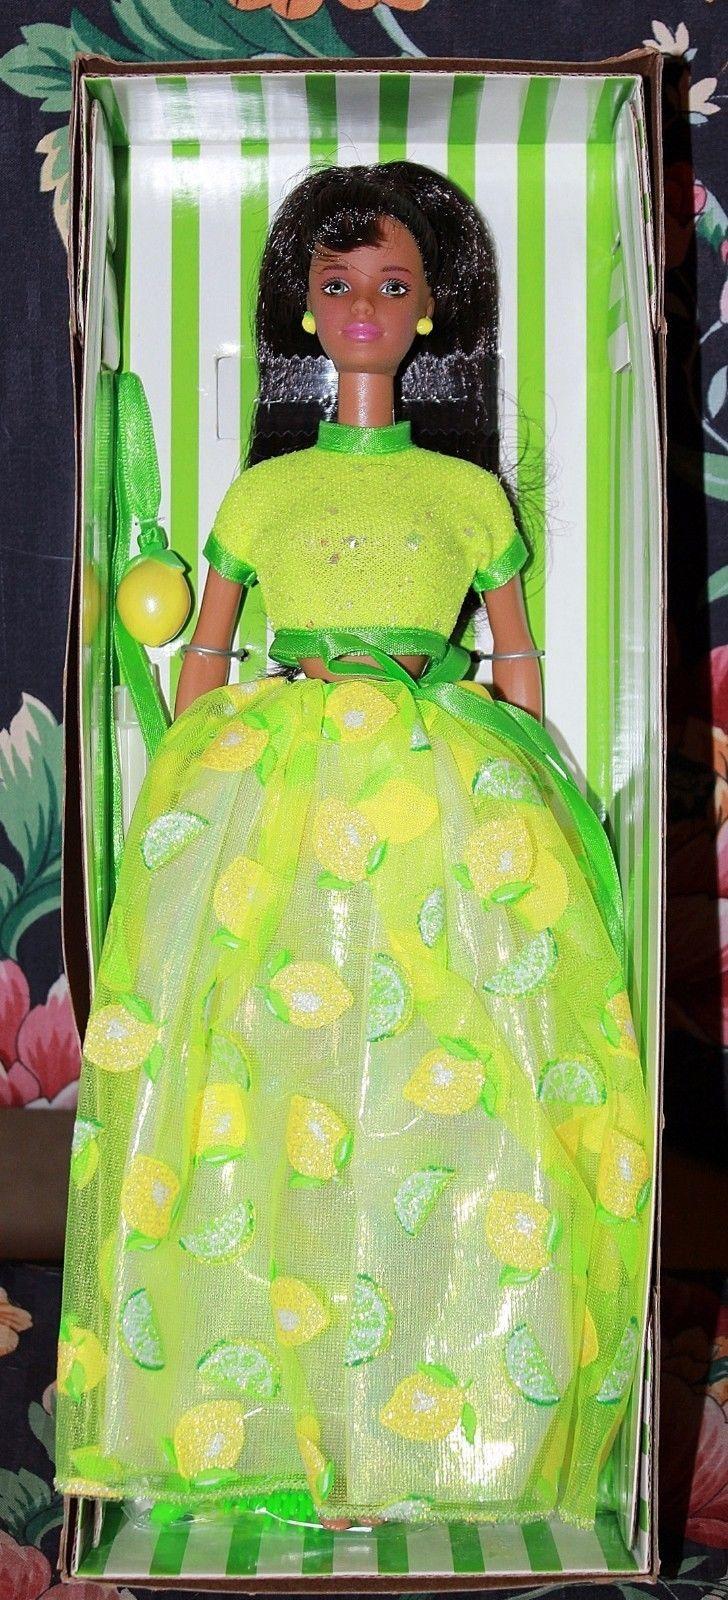 Barbie Lemon Lime Sorbet Mattel Avon Exclusive 1998